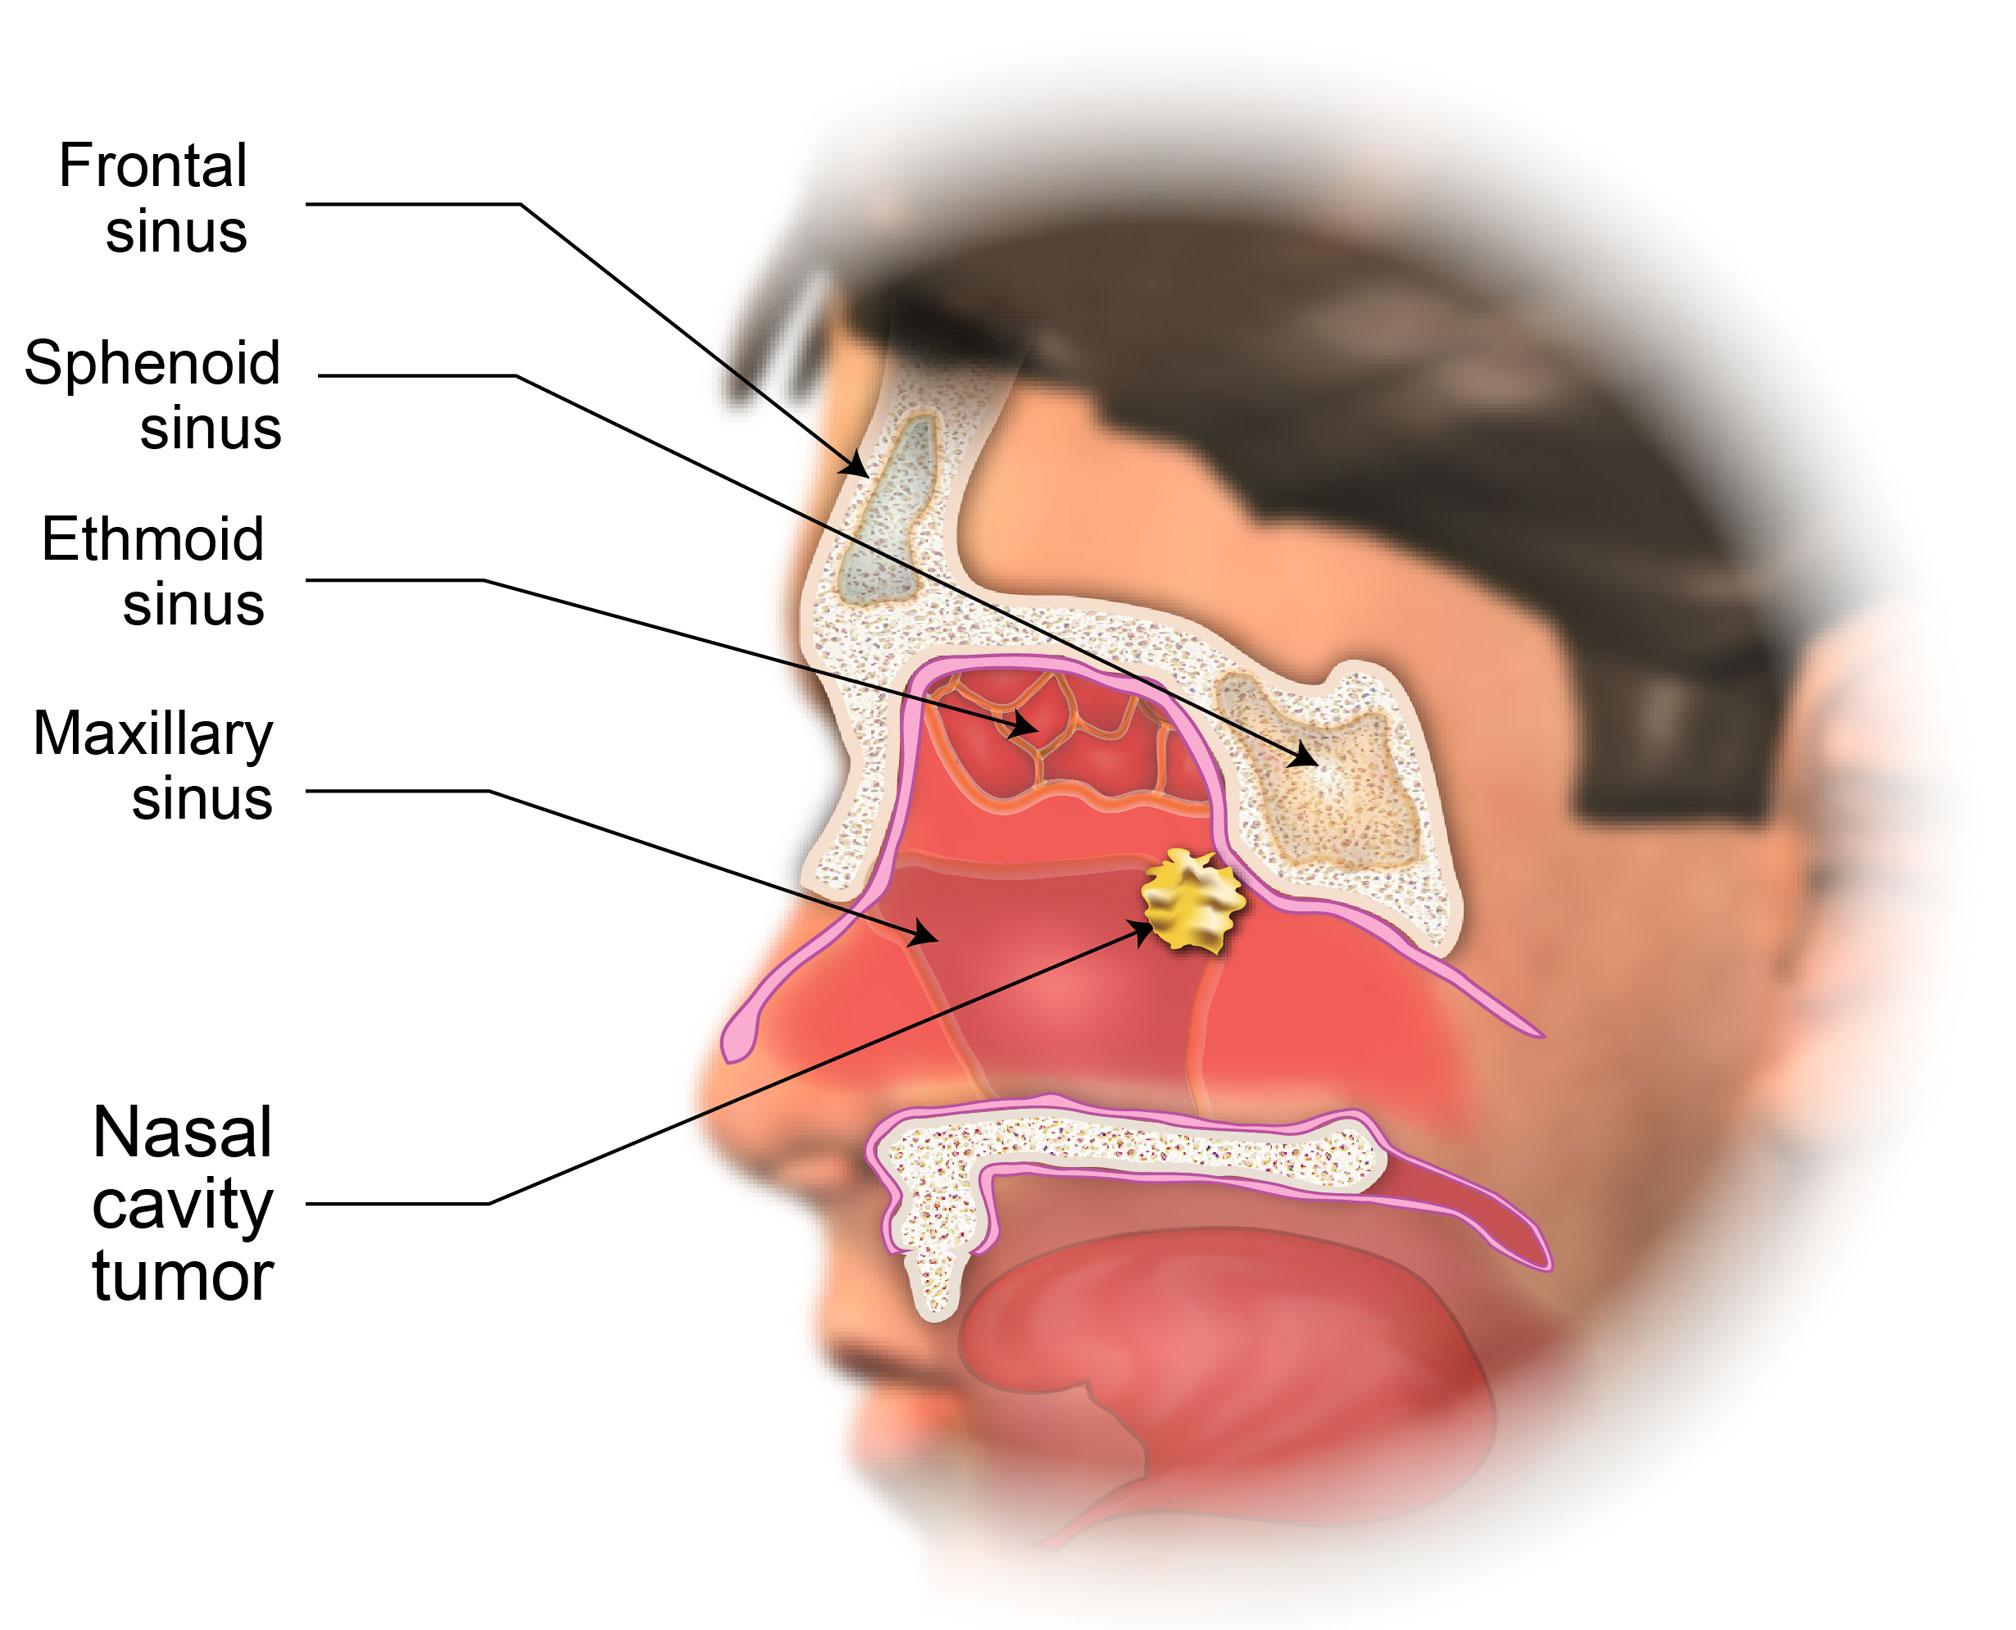 Hpv virus causes warts Hpv nasal cavity